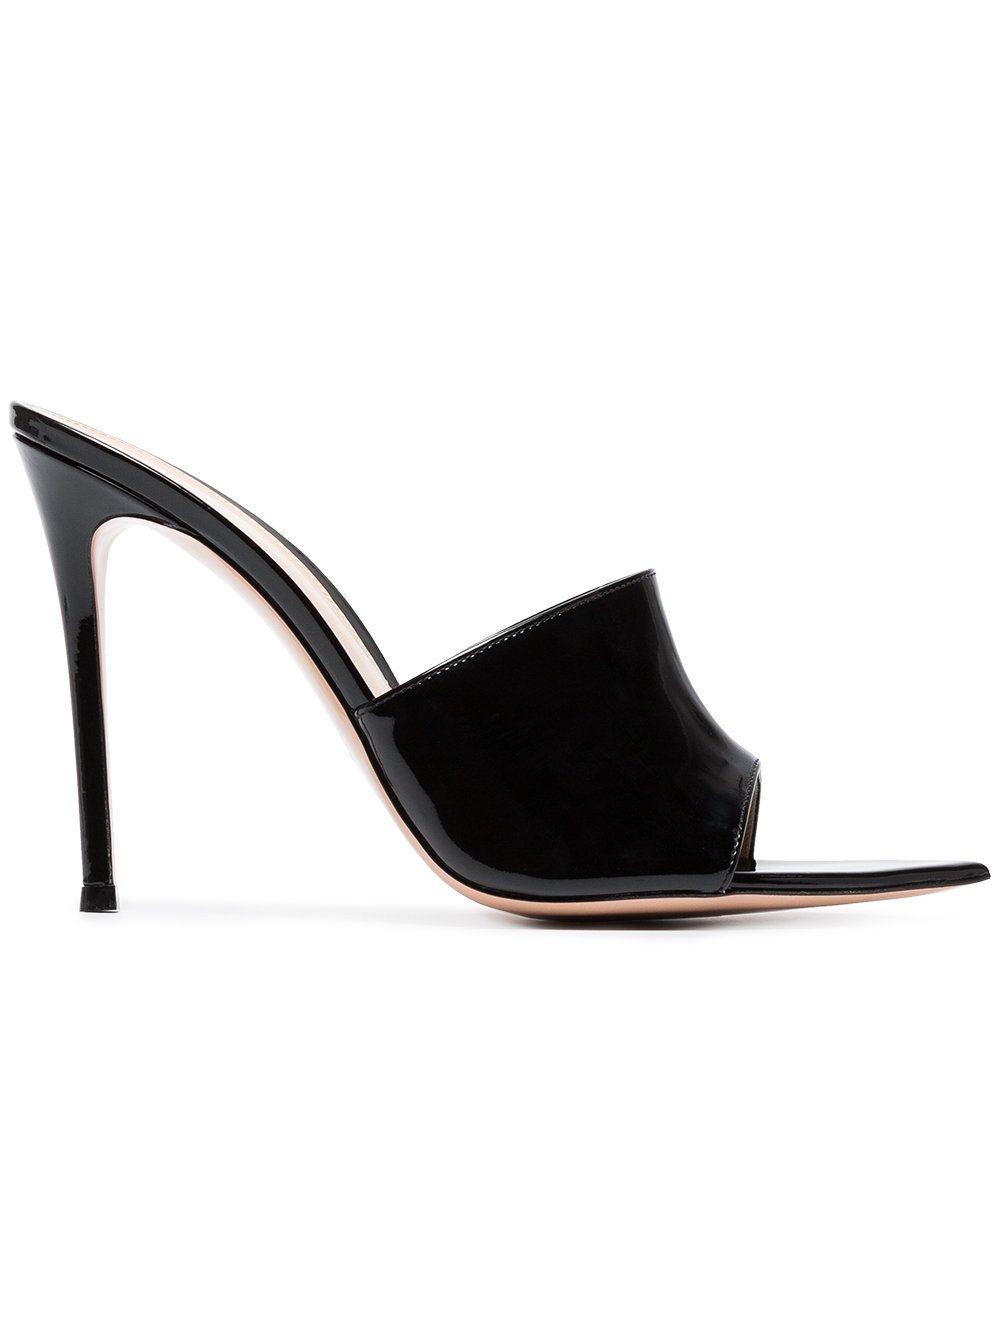 2c4d1b2bb7b03 GIANVITO ROSSI BLACK 105 PATENT LEATHER OPEN TOE MULES.  gianvitorossi   shoes